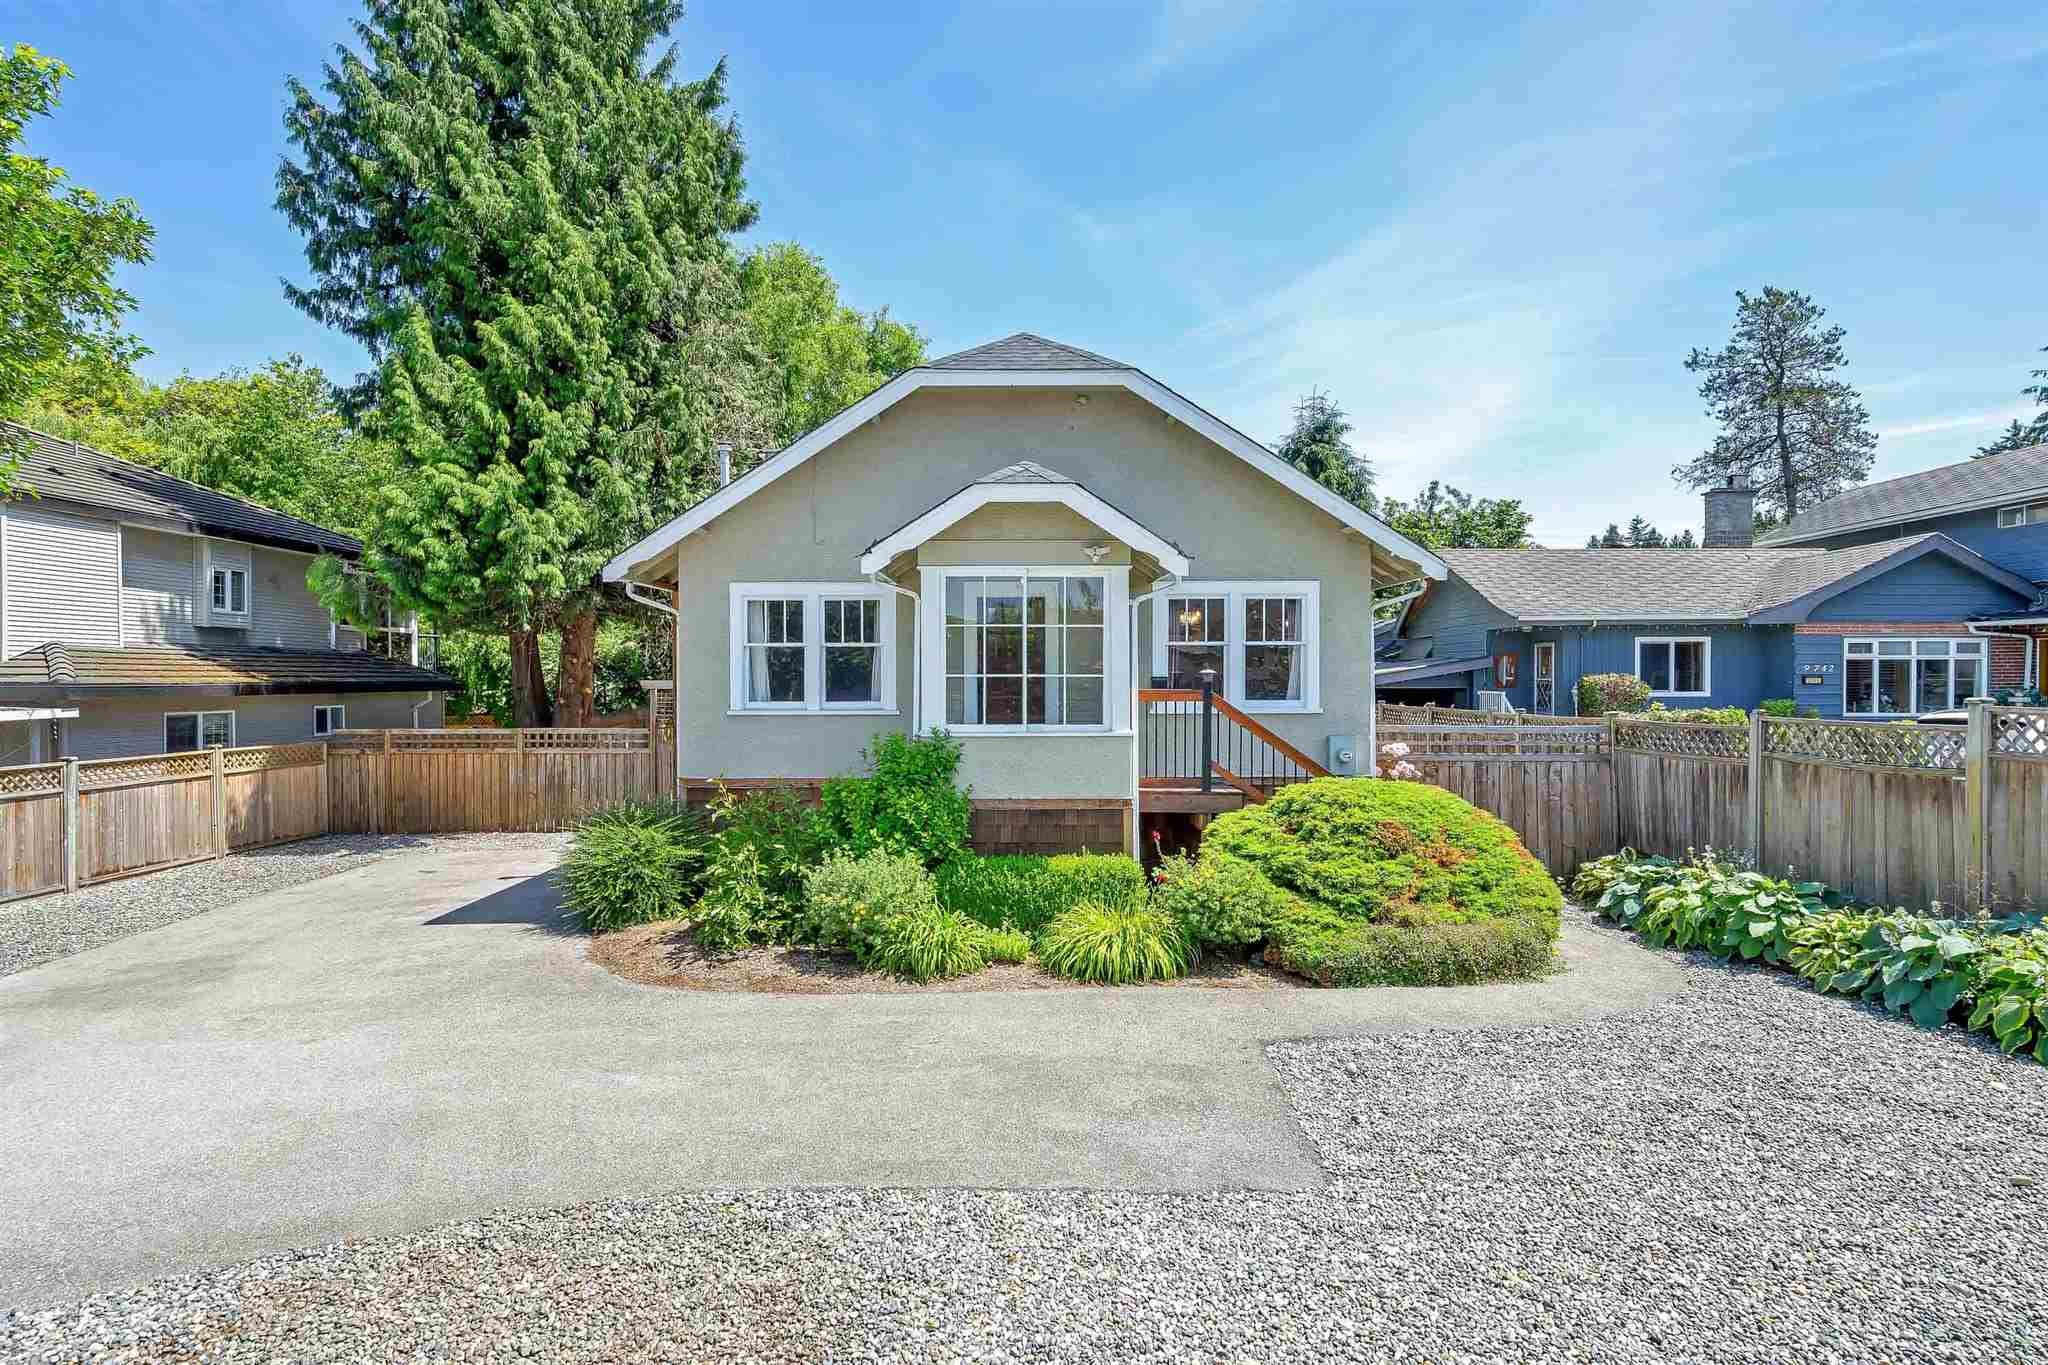 9746 120 STREET - Cedar Hills House/Single Family for sale, 4 Bedrooms (R2606725)